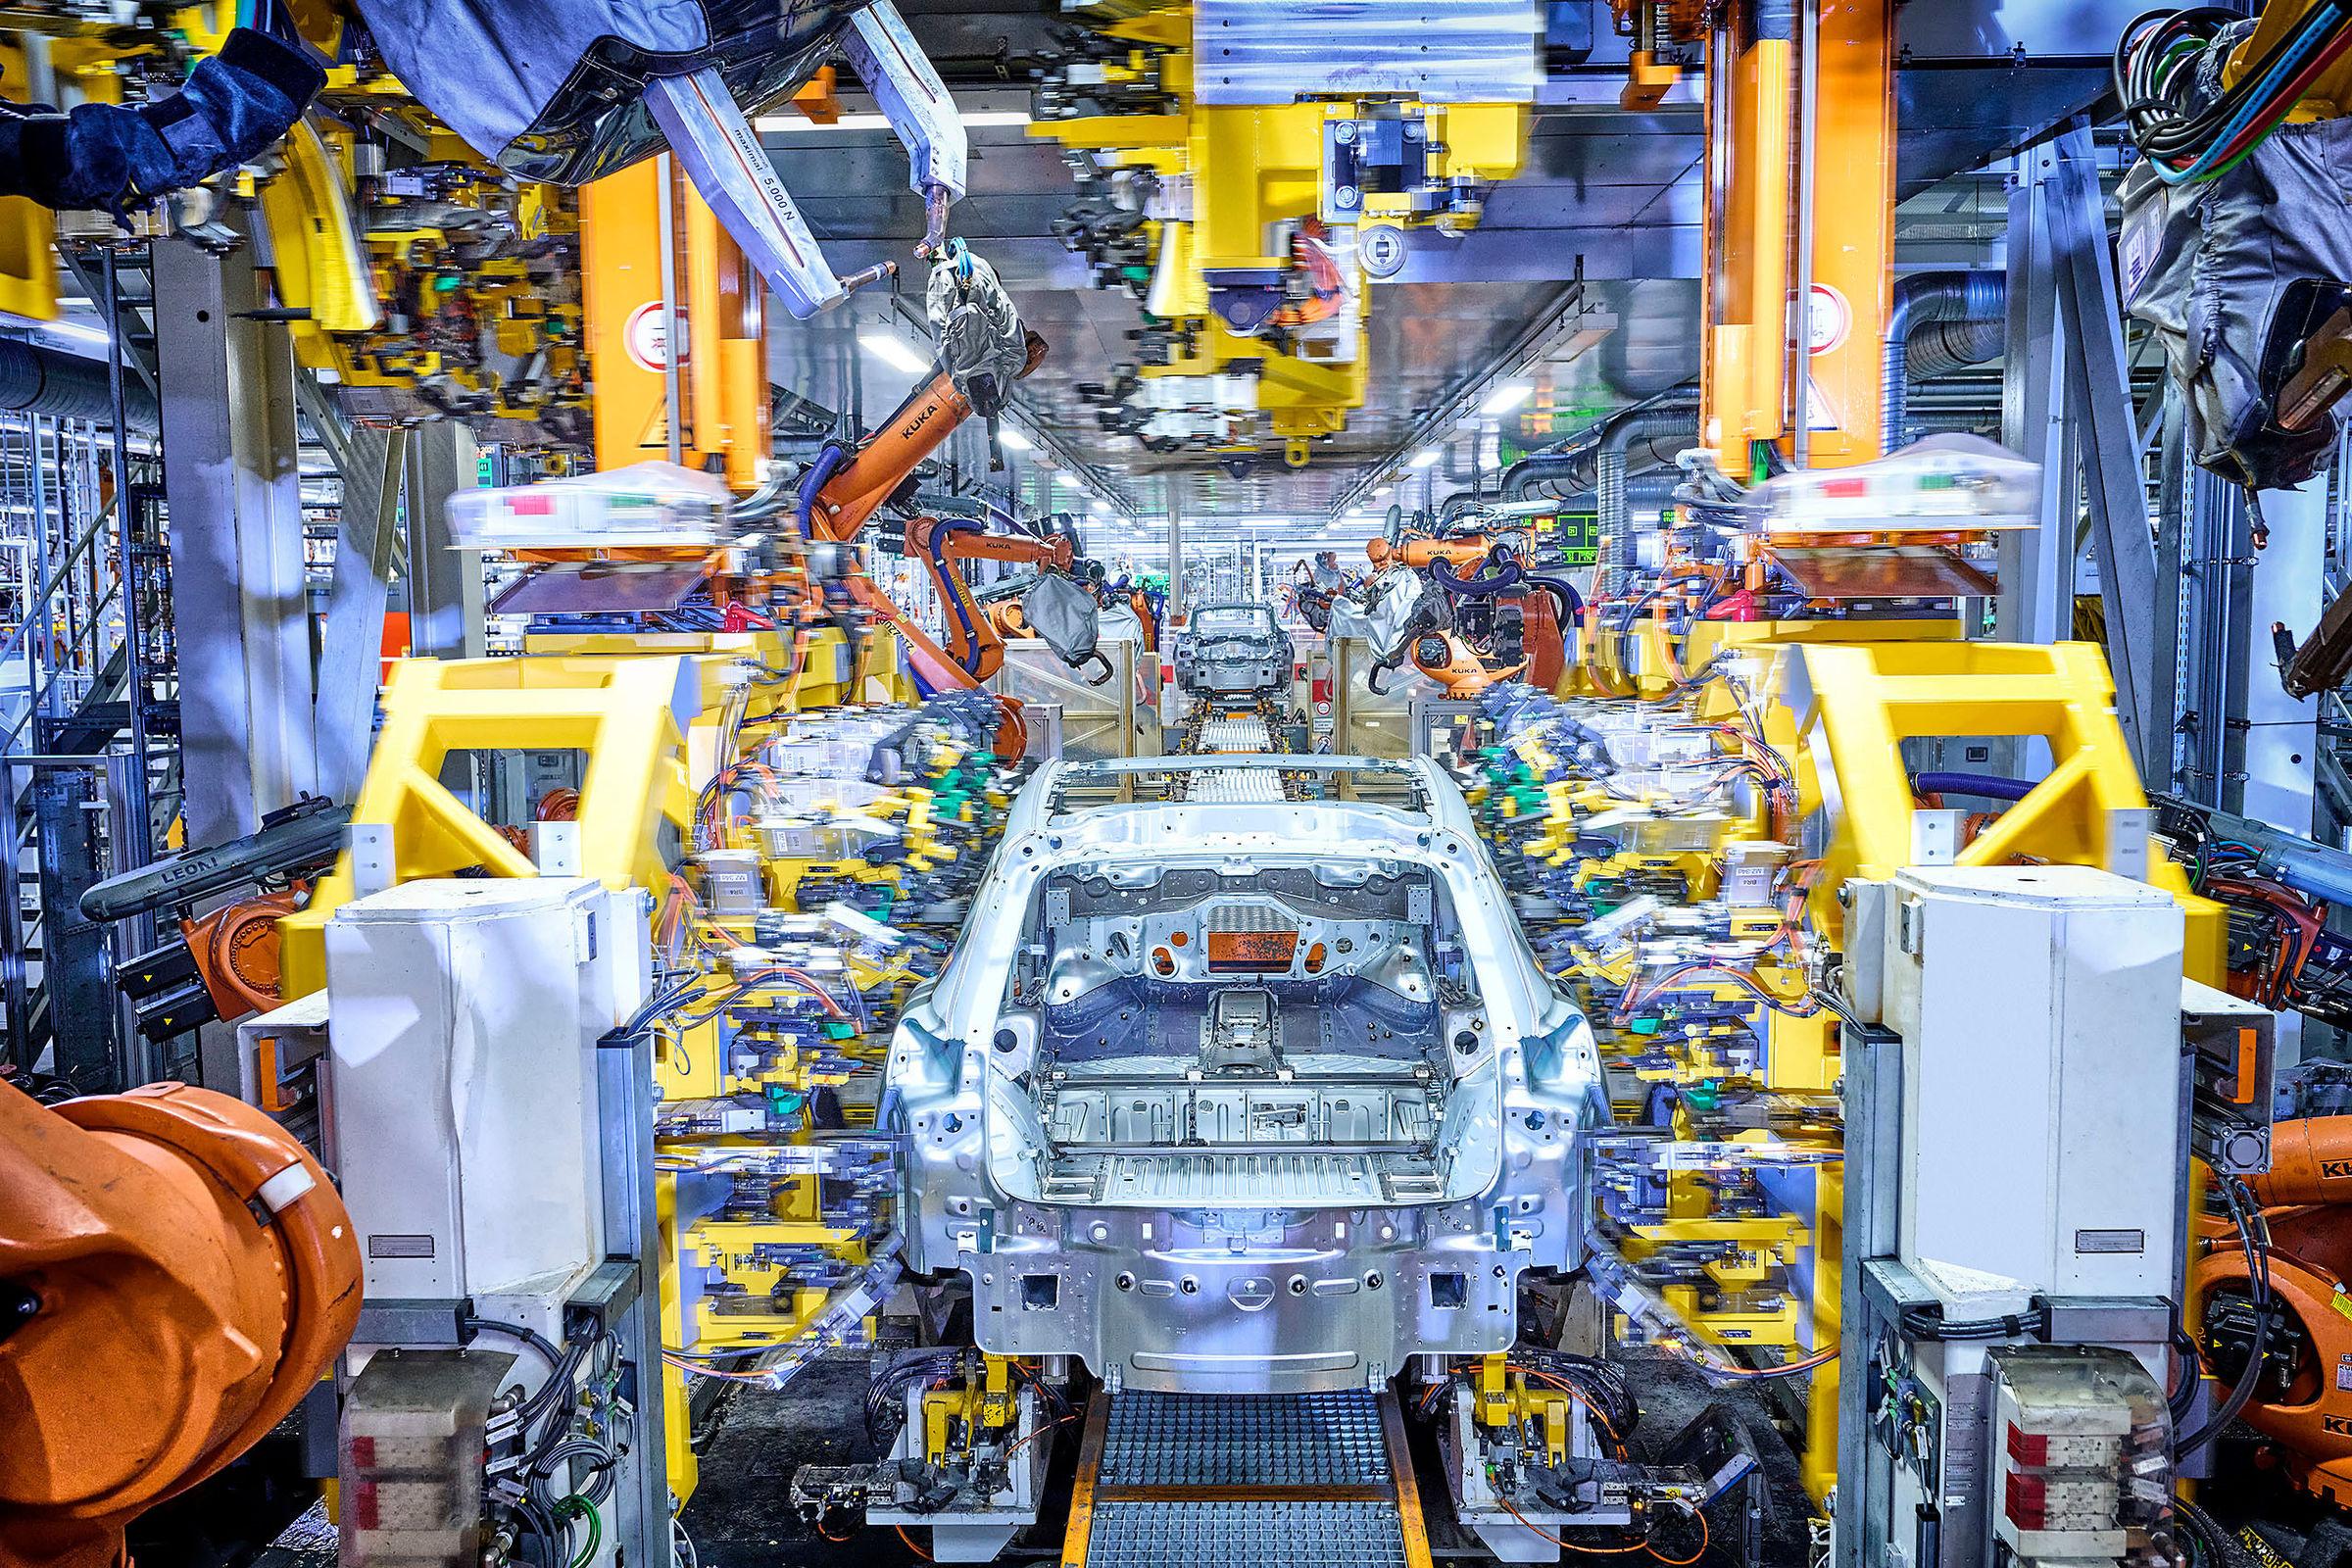 Start of production for Audi Q4 e-tron - Image 5